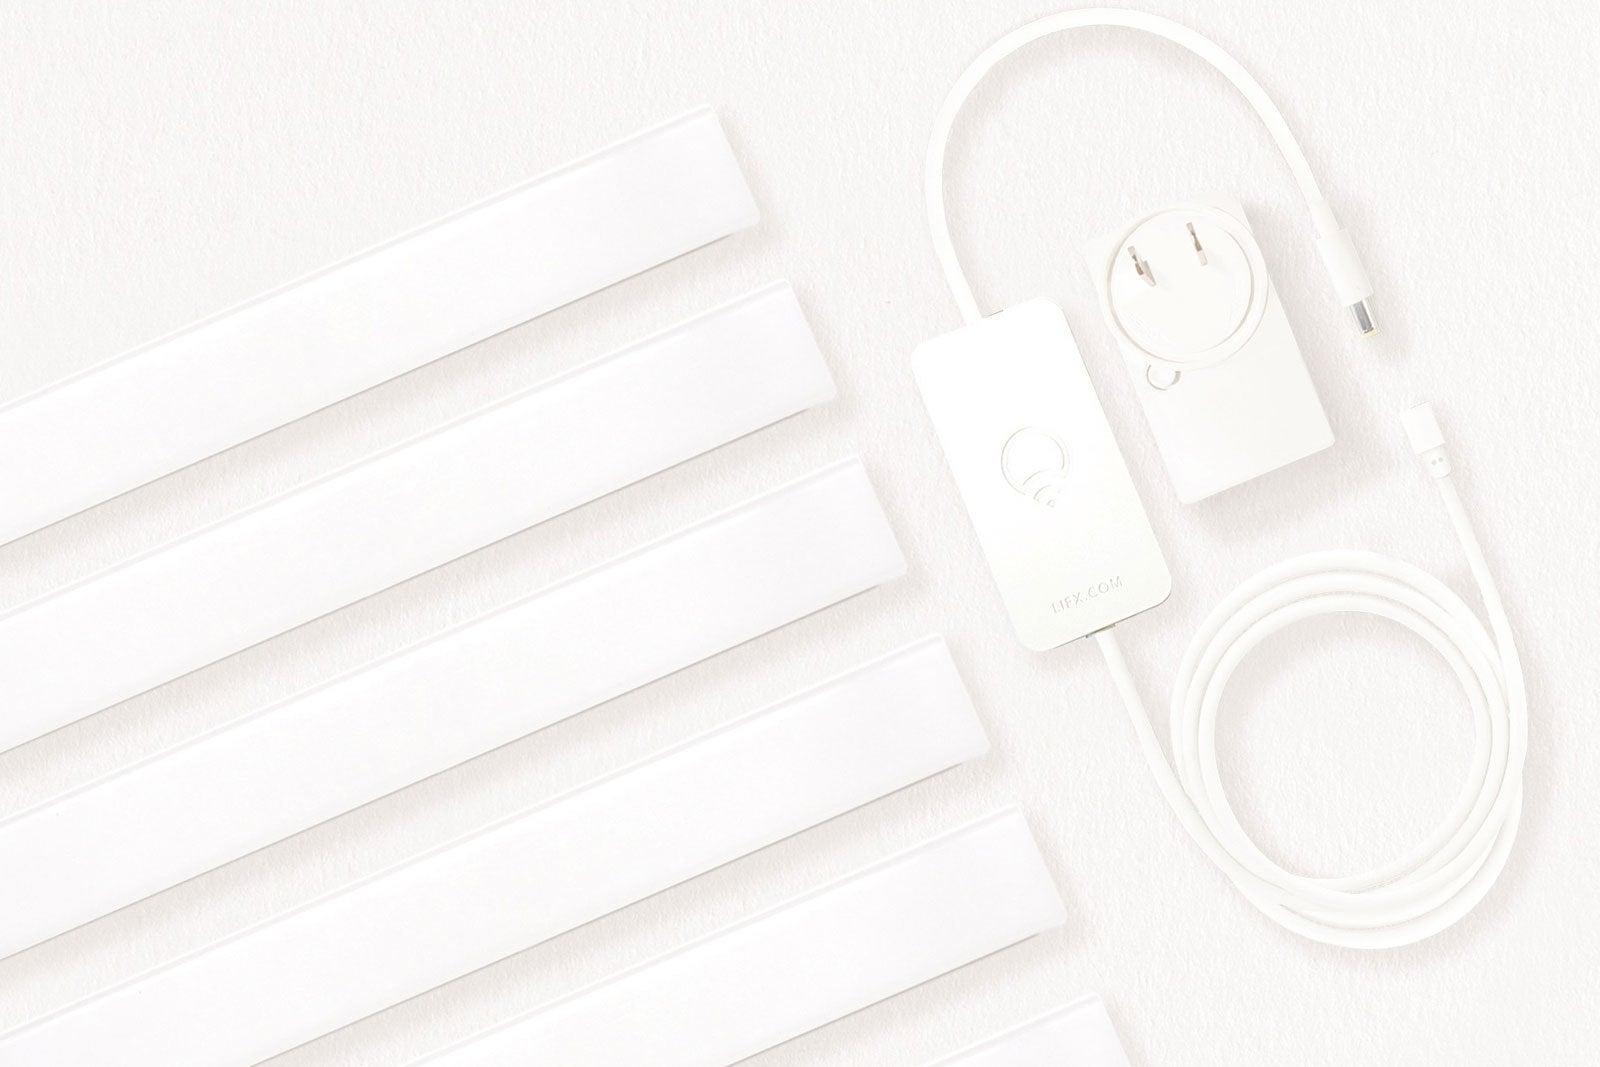 lifx beam review  six feet of decorative lighting that